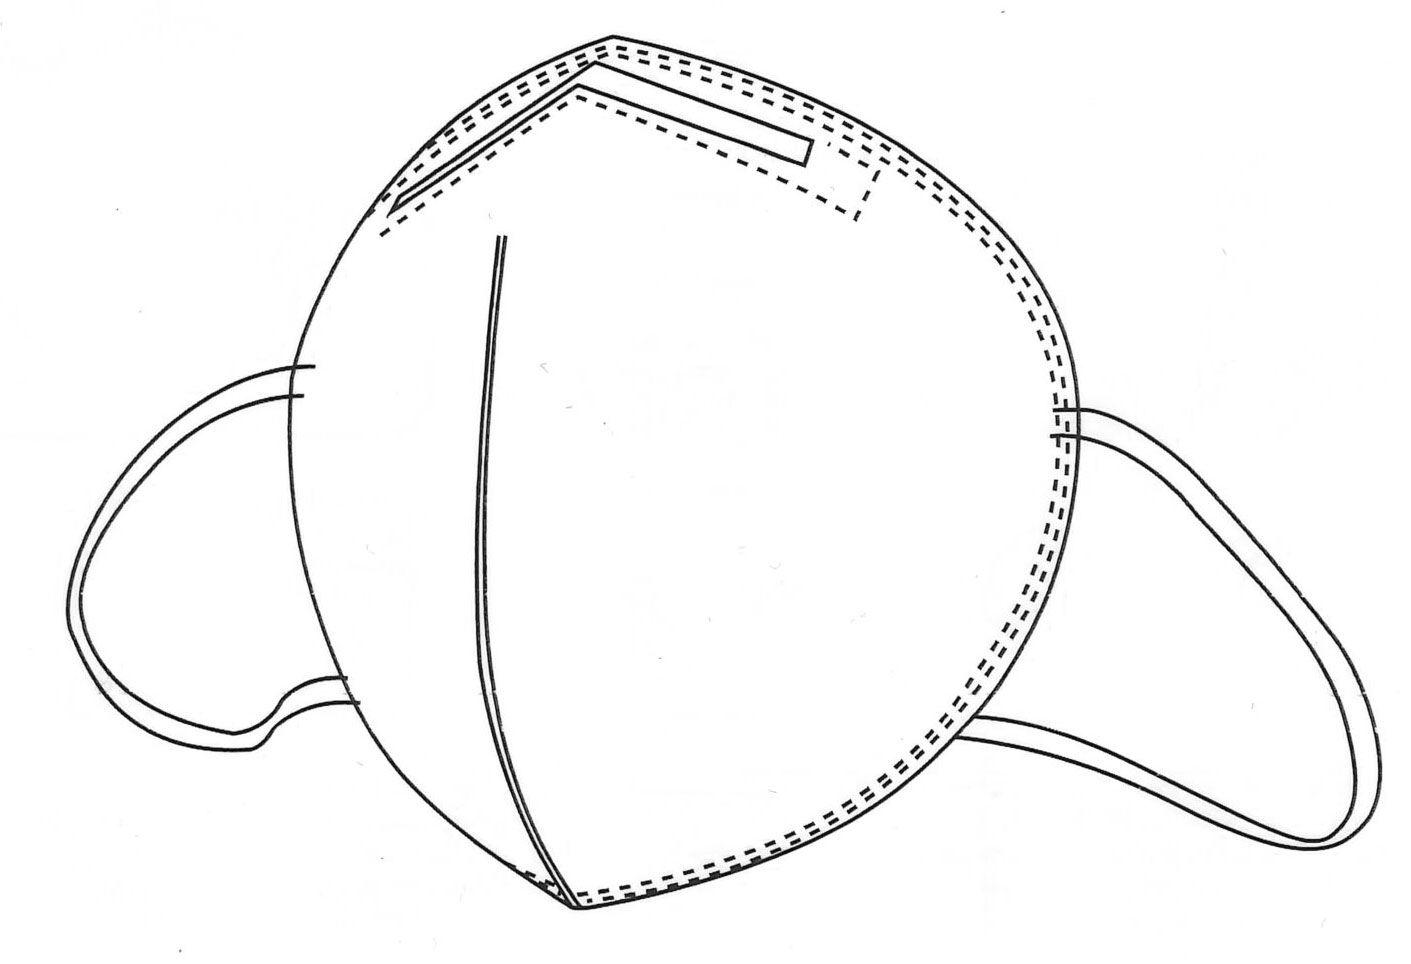 Kn95 Ffp2 Unvalved Face Mask Pack Of 10